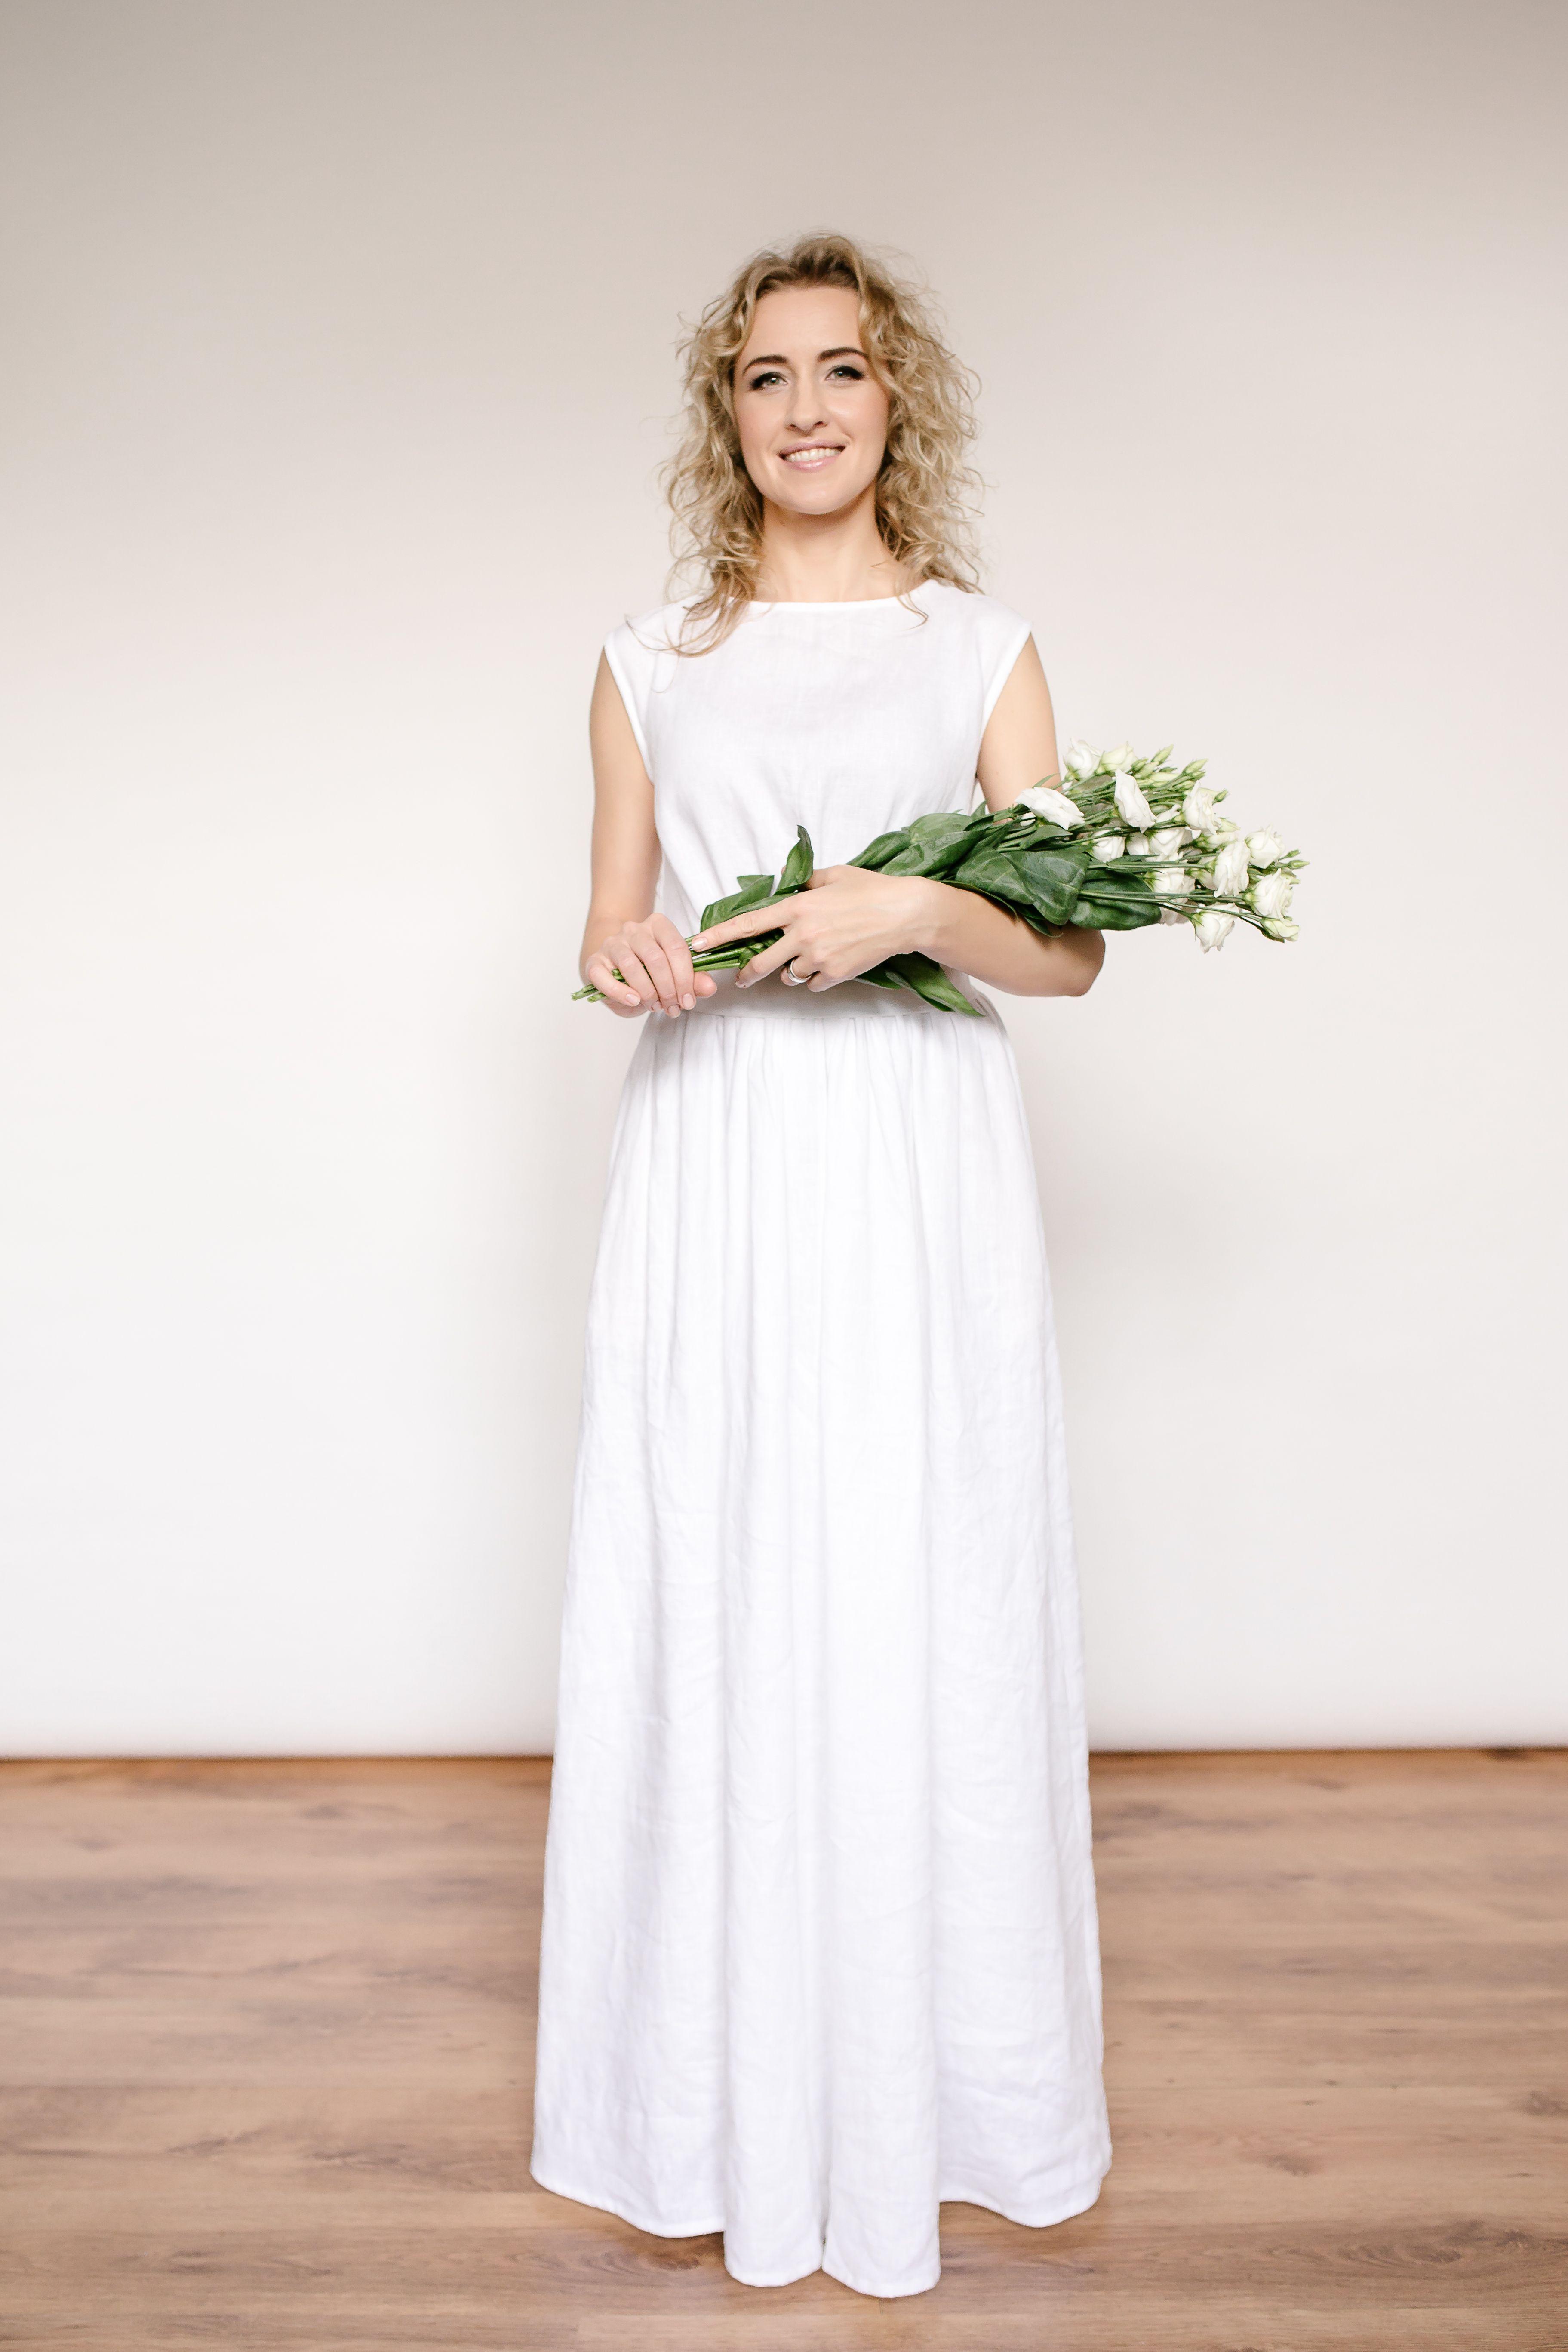 Linen greek style wedding dress | Wedding dress and Wedding